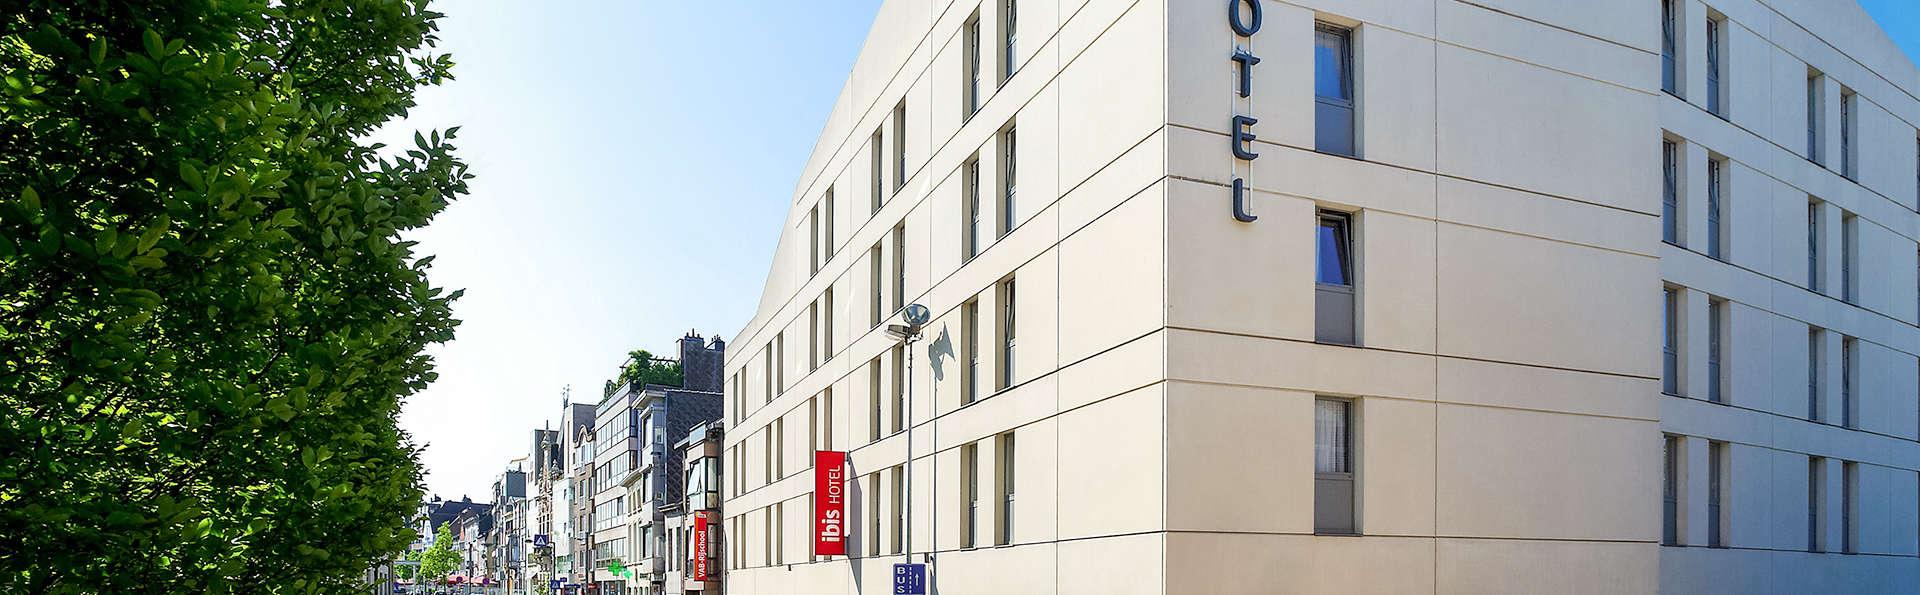 Ibis Hotel Sint-Niklaas Centrum - Edit_Front.jpg